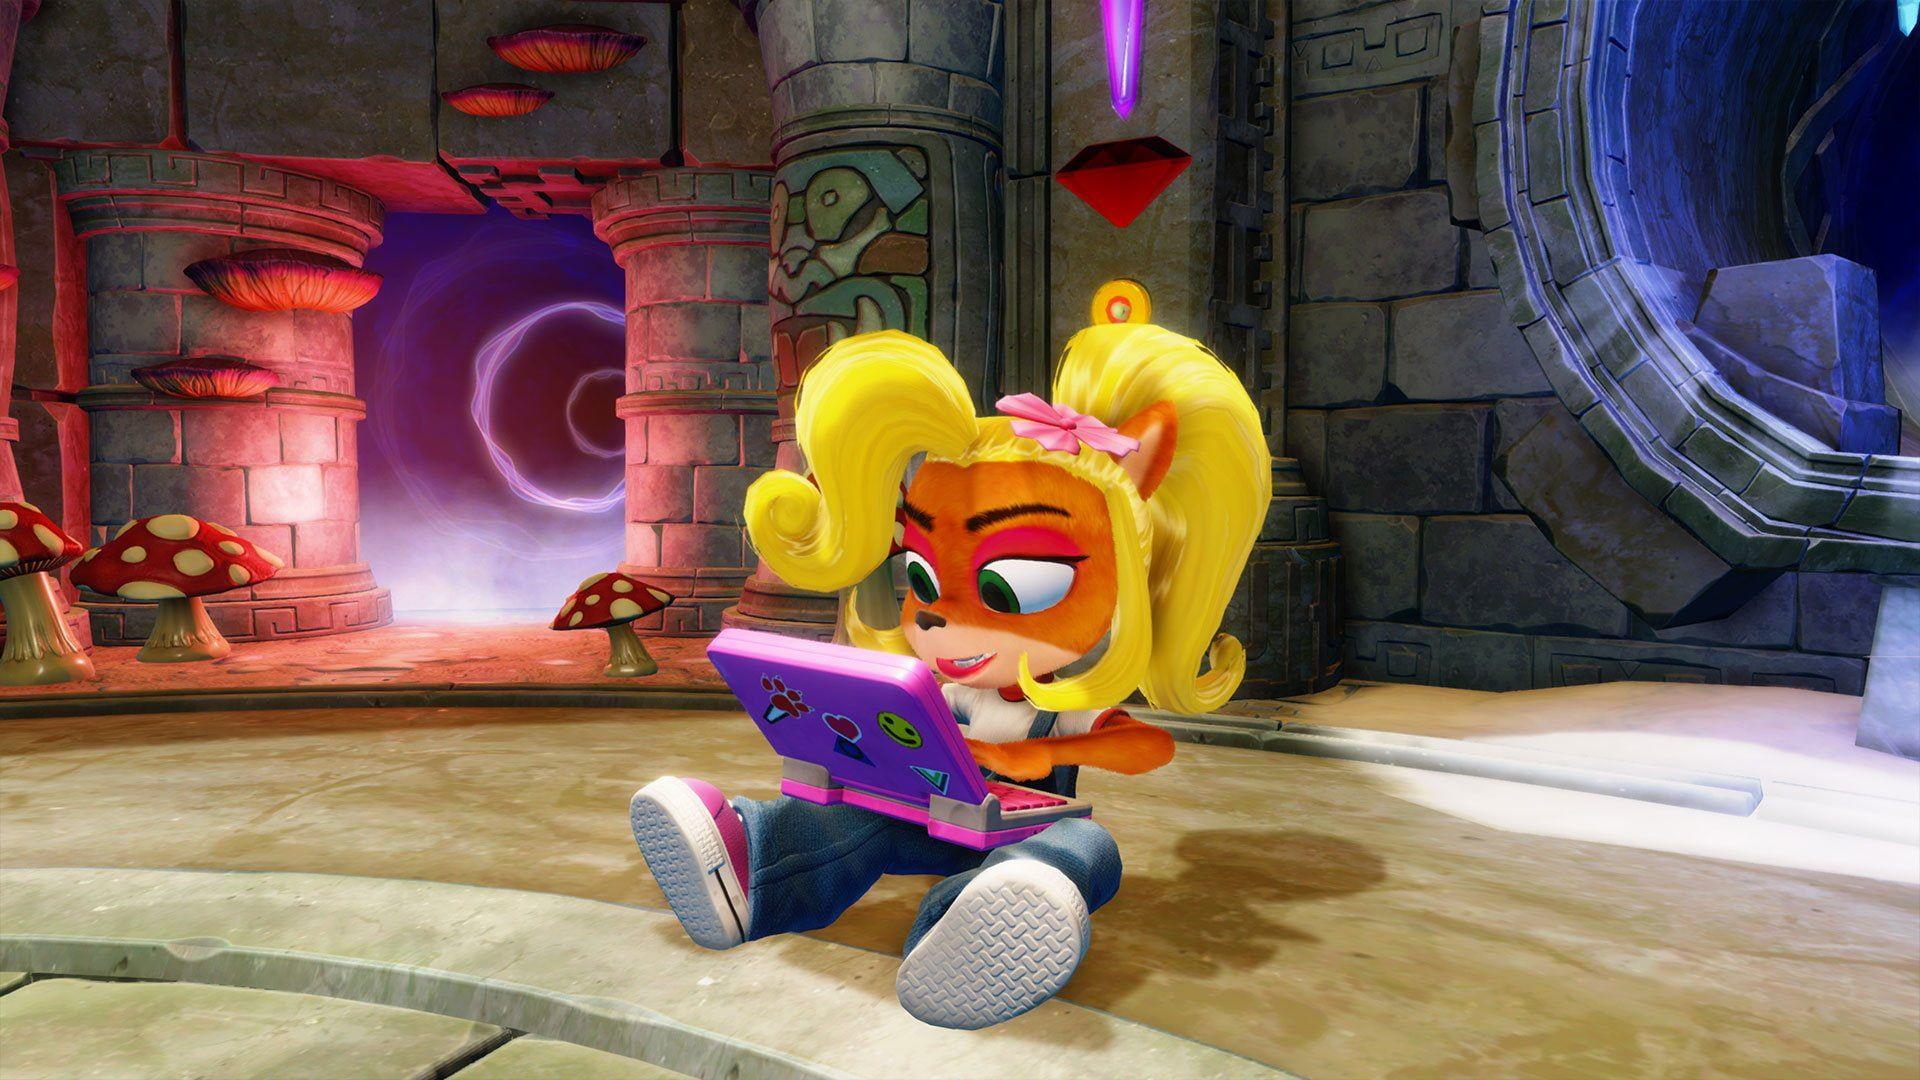 Video Game Crash Bandicoot N Sane Trilogy Coco Bandicoot 1080p